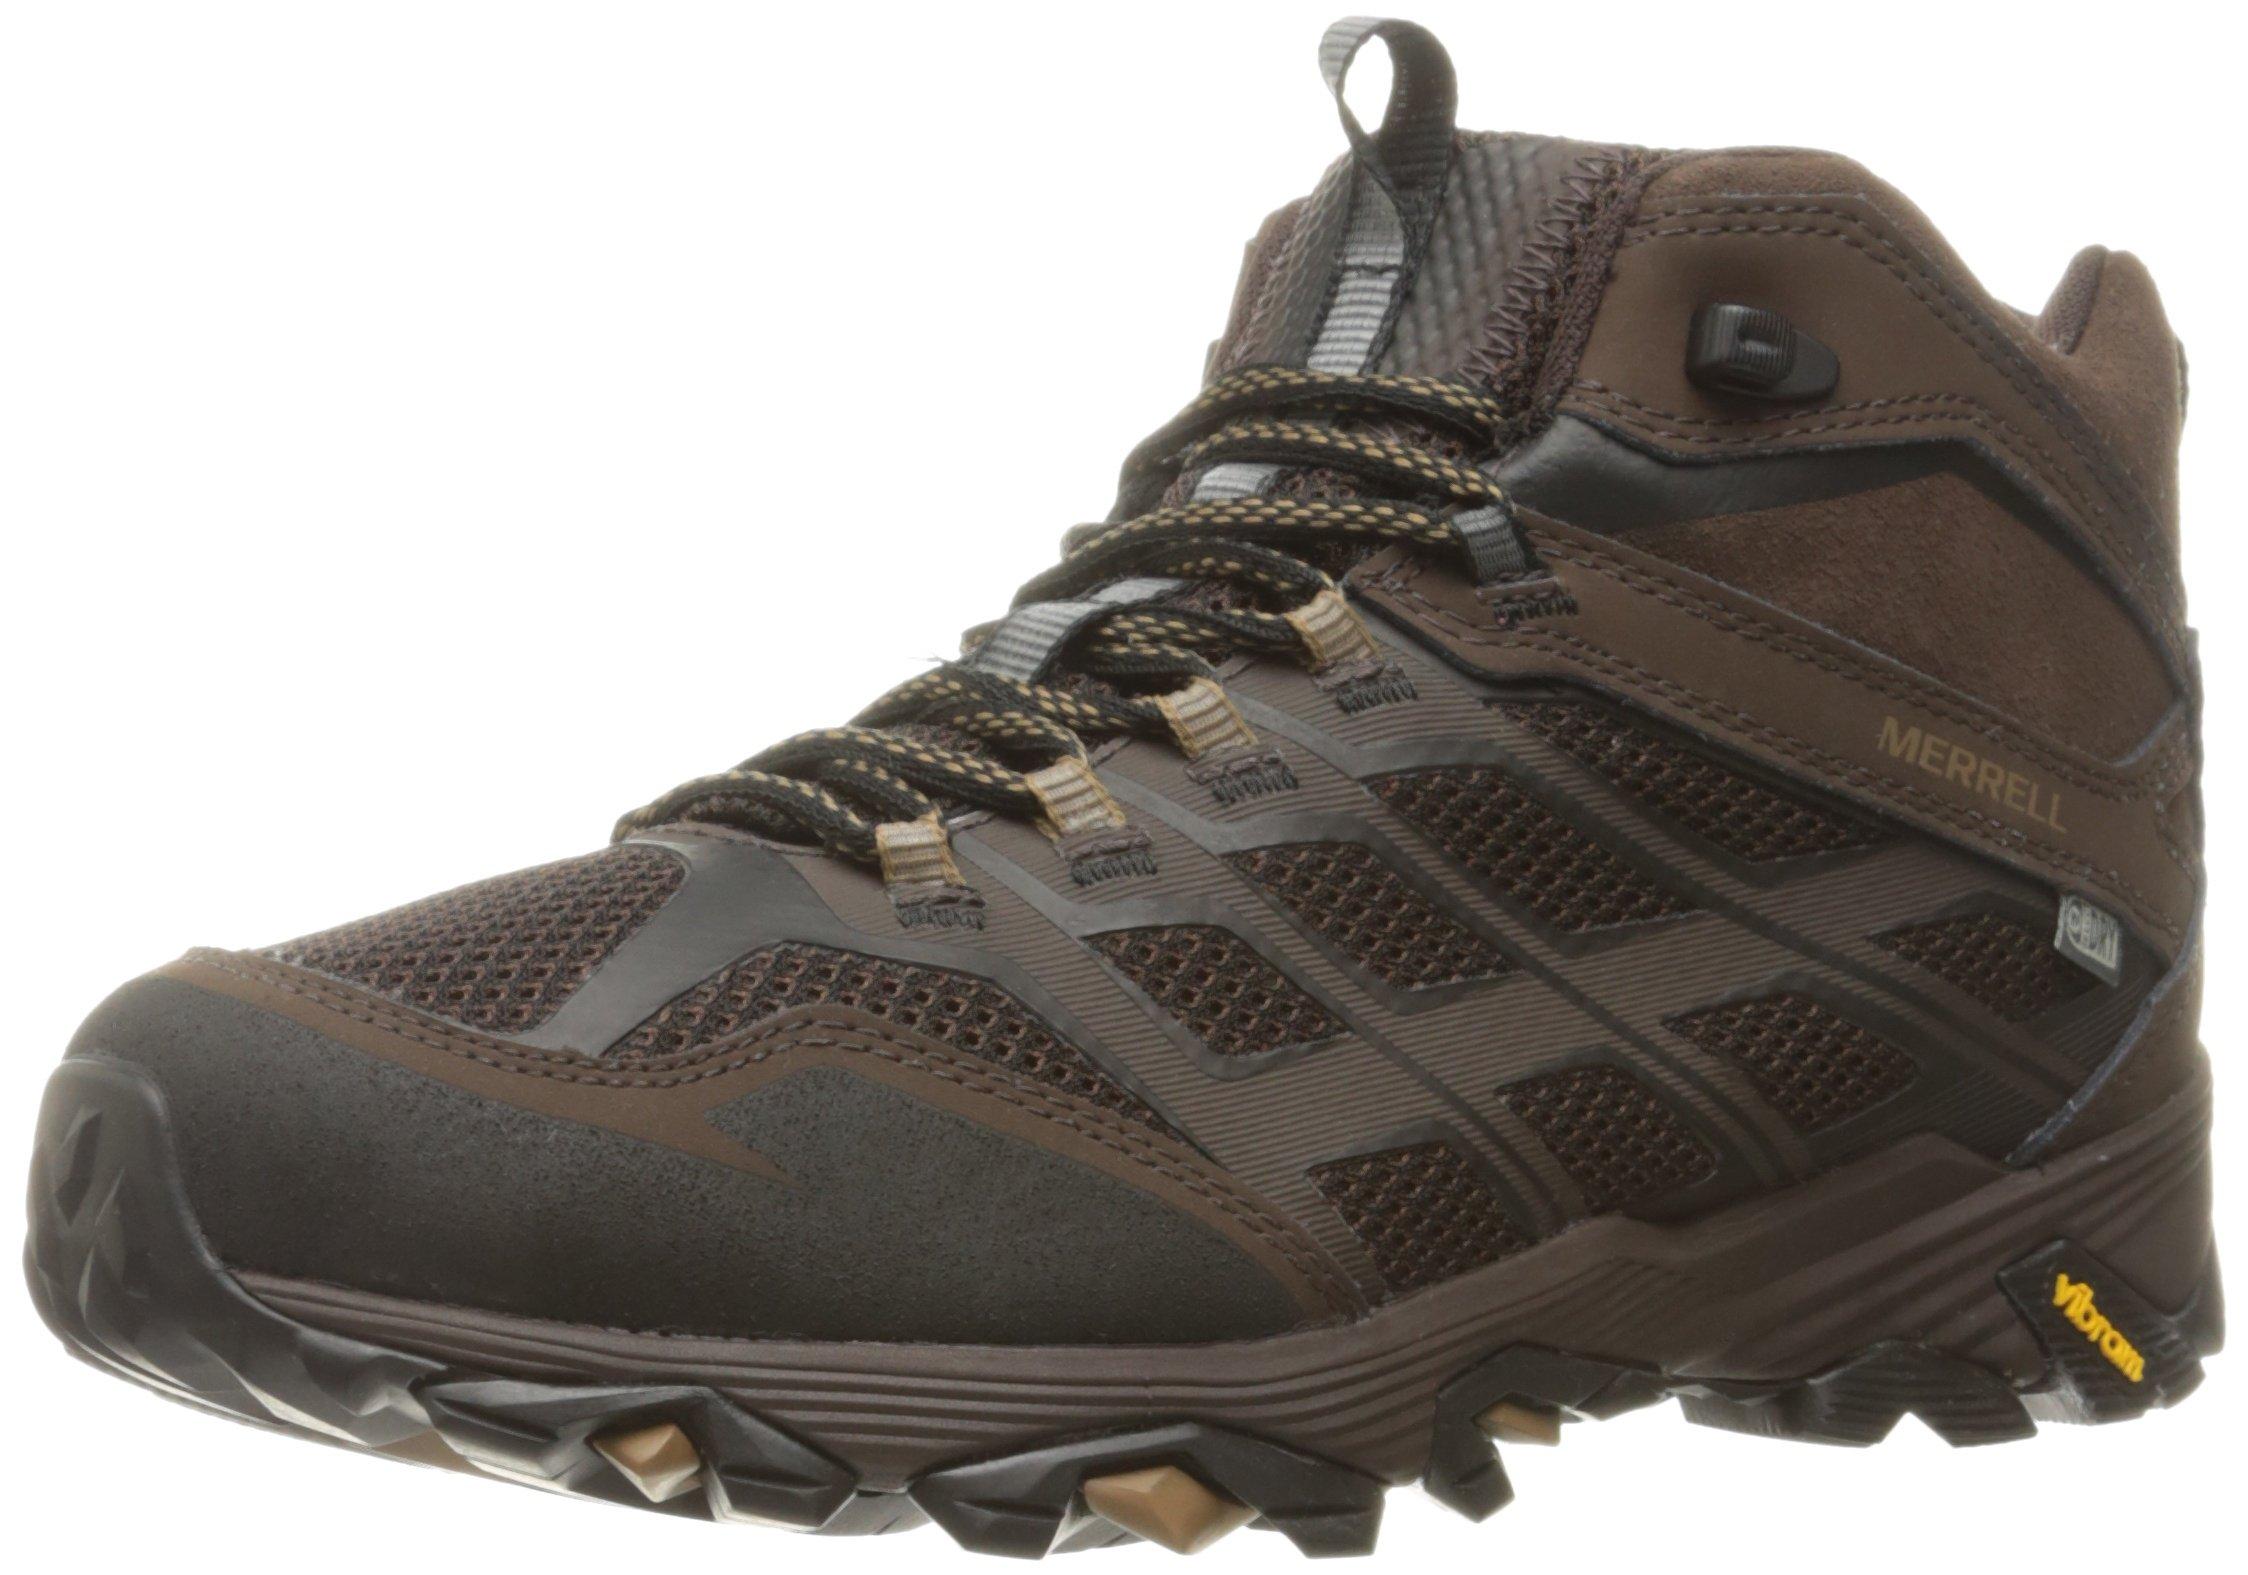 Merrell Men's Moab FST Mid Waterproof Hiking Shoe, Brown, 13 M US